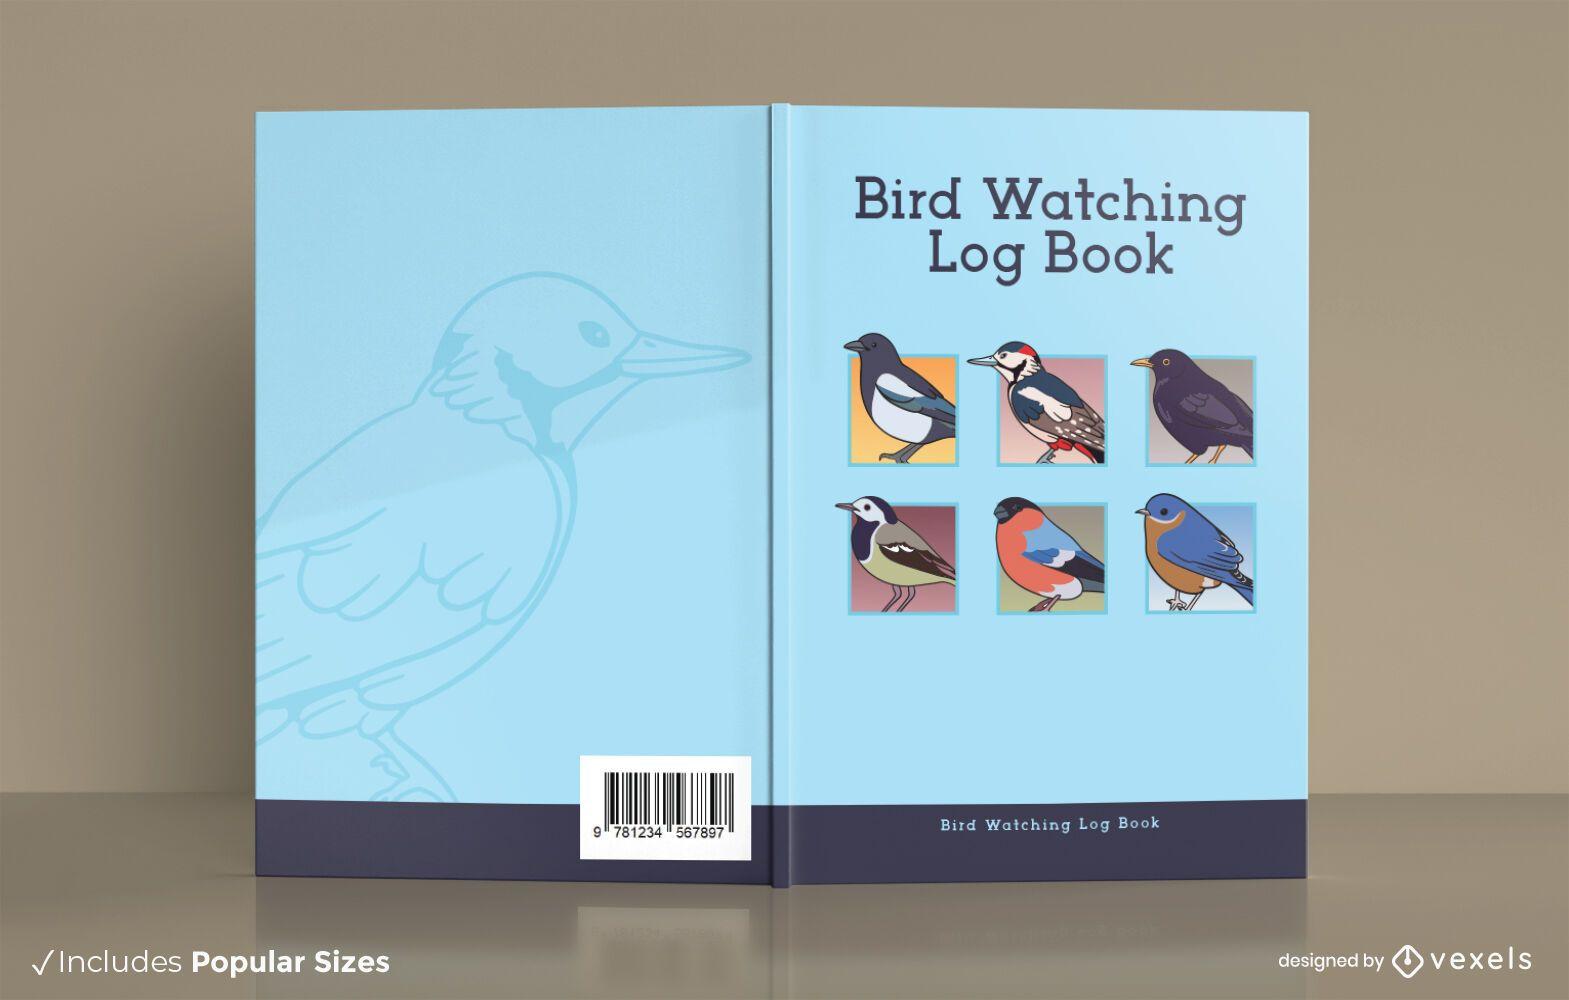 Bird watching log book cover design